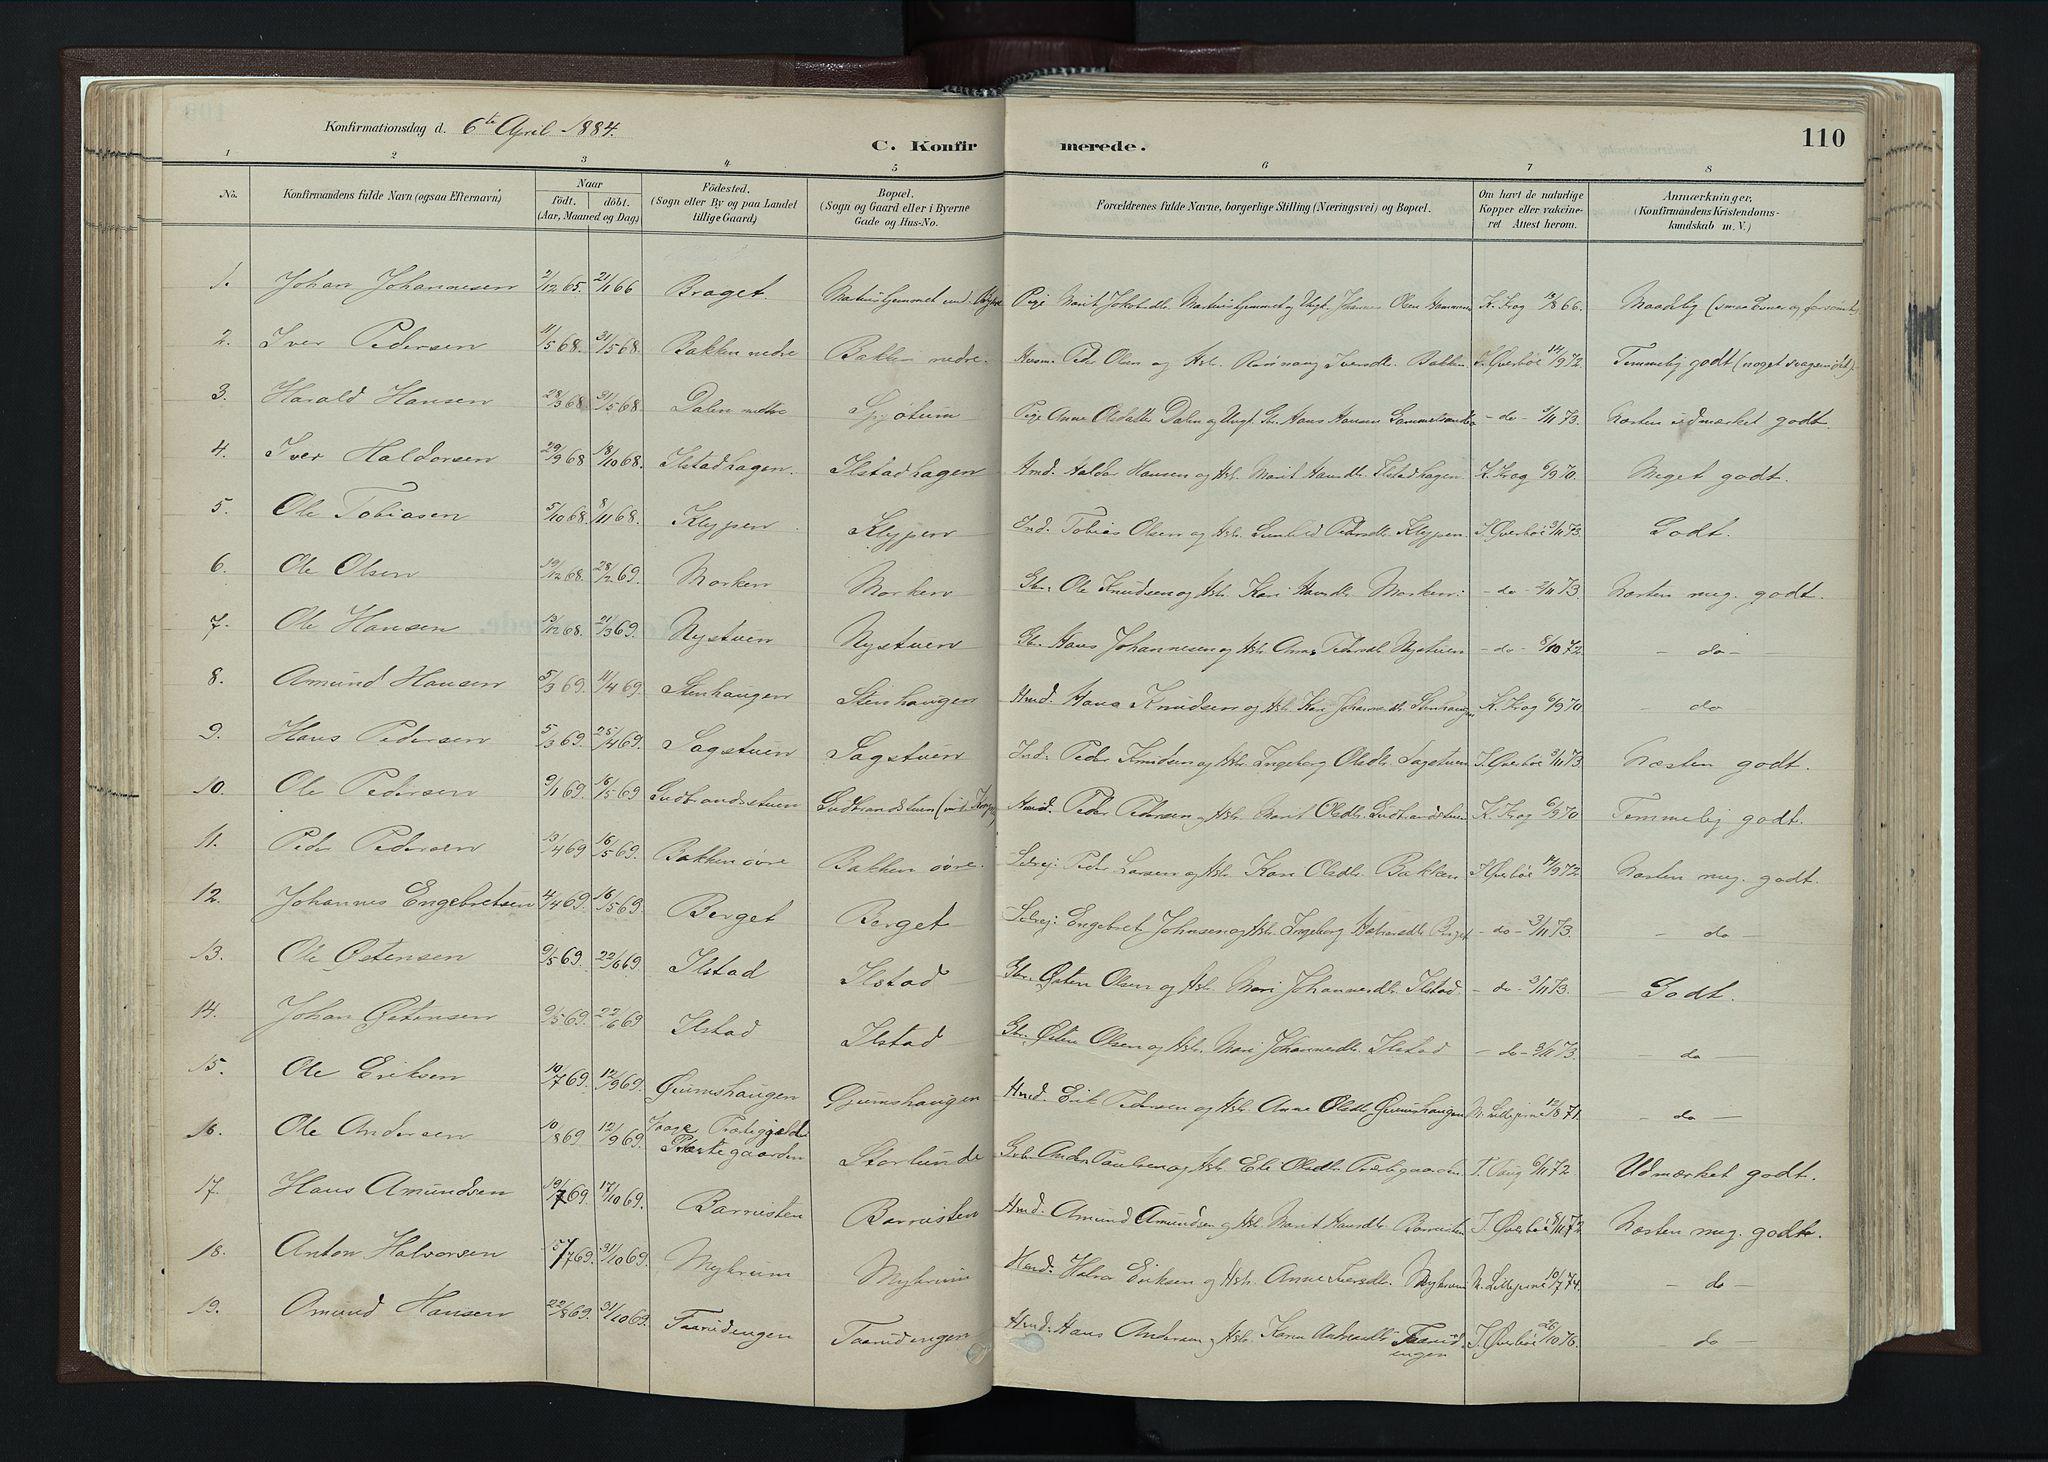 SAH, Nord-Fron prestekontor, Ministerialbok nr. 4, 1884-1914, s. 110